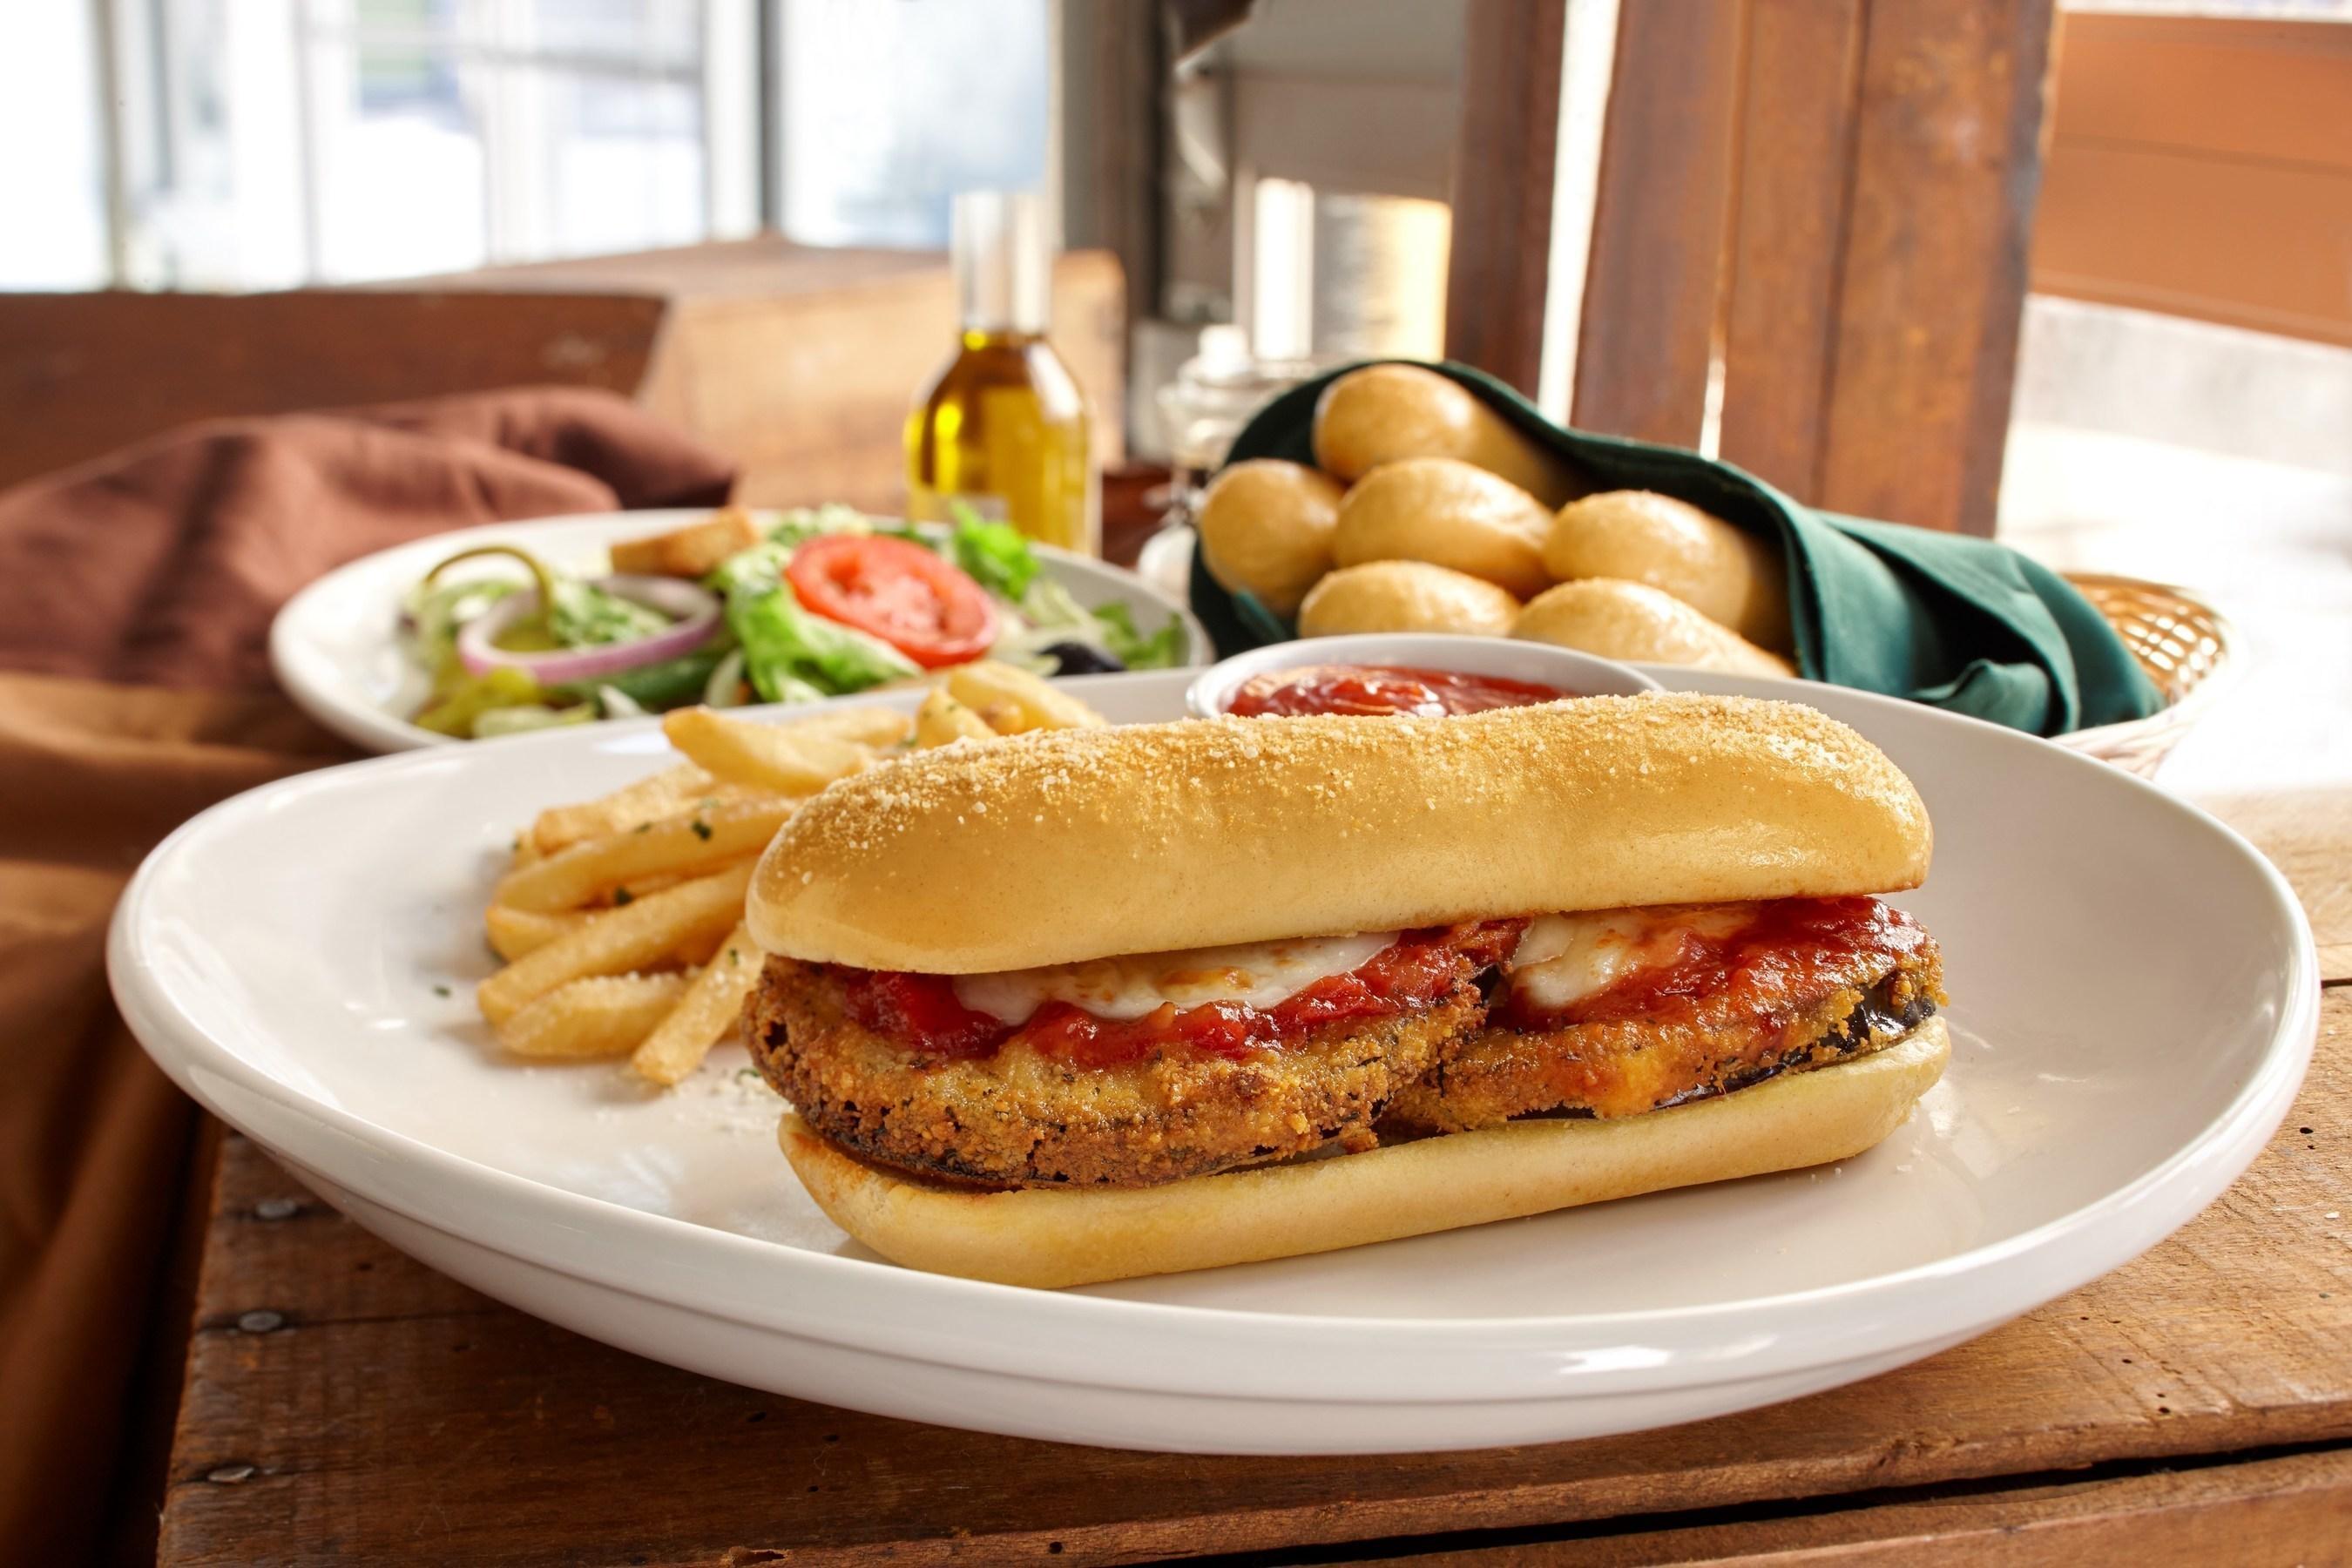 Olive Garden Eggplant Parmigiana Breadstick Sandwich